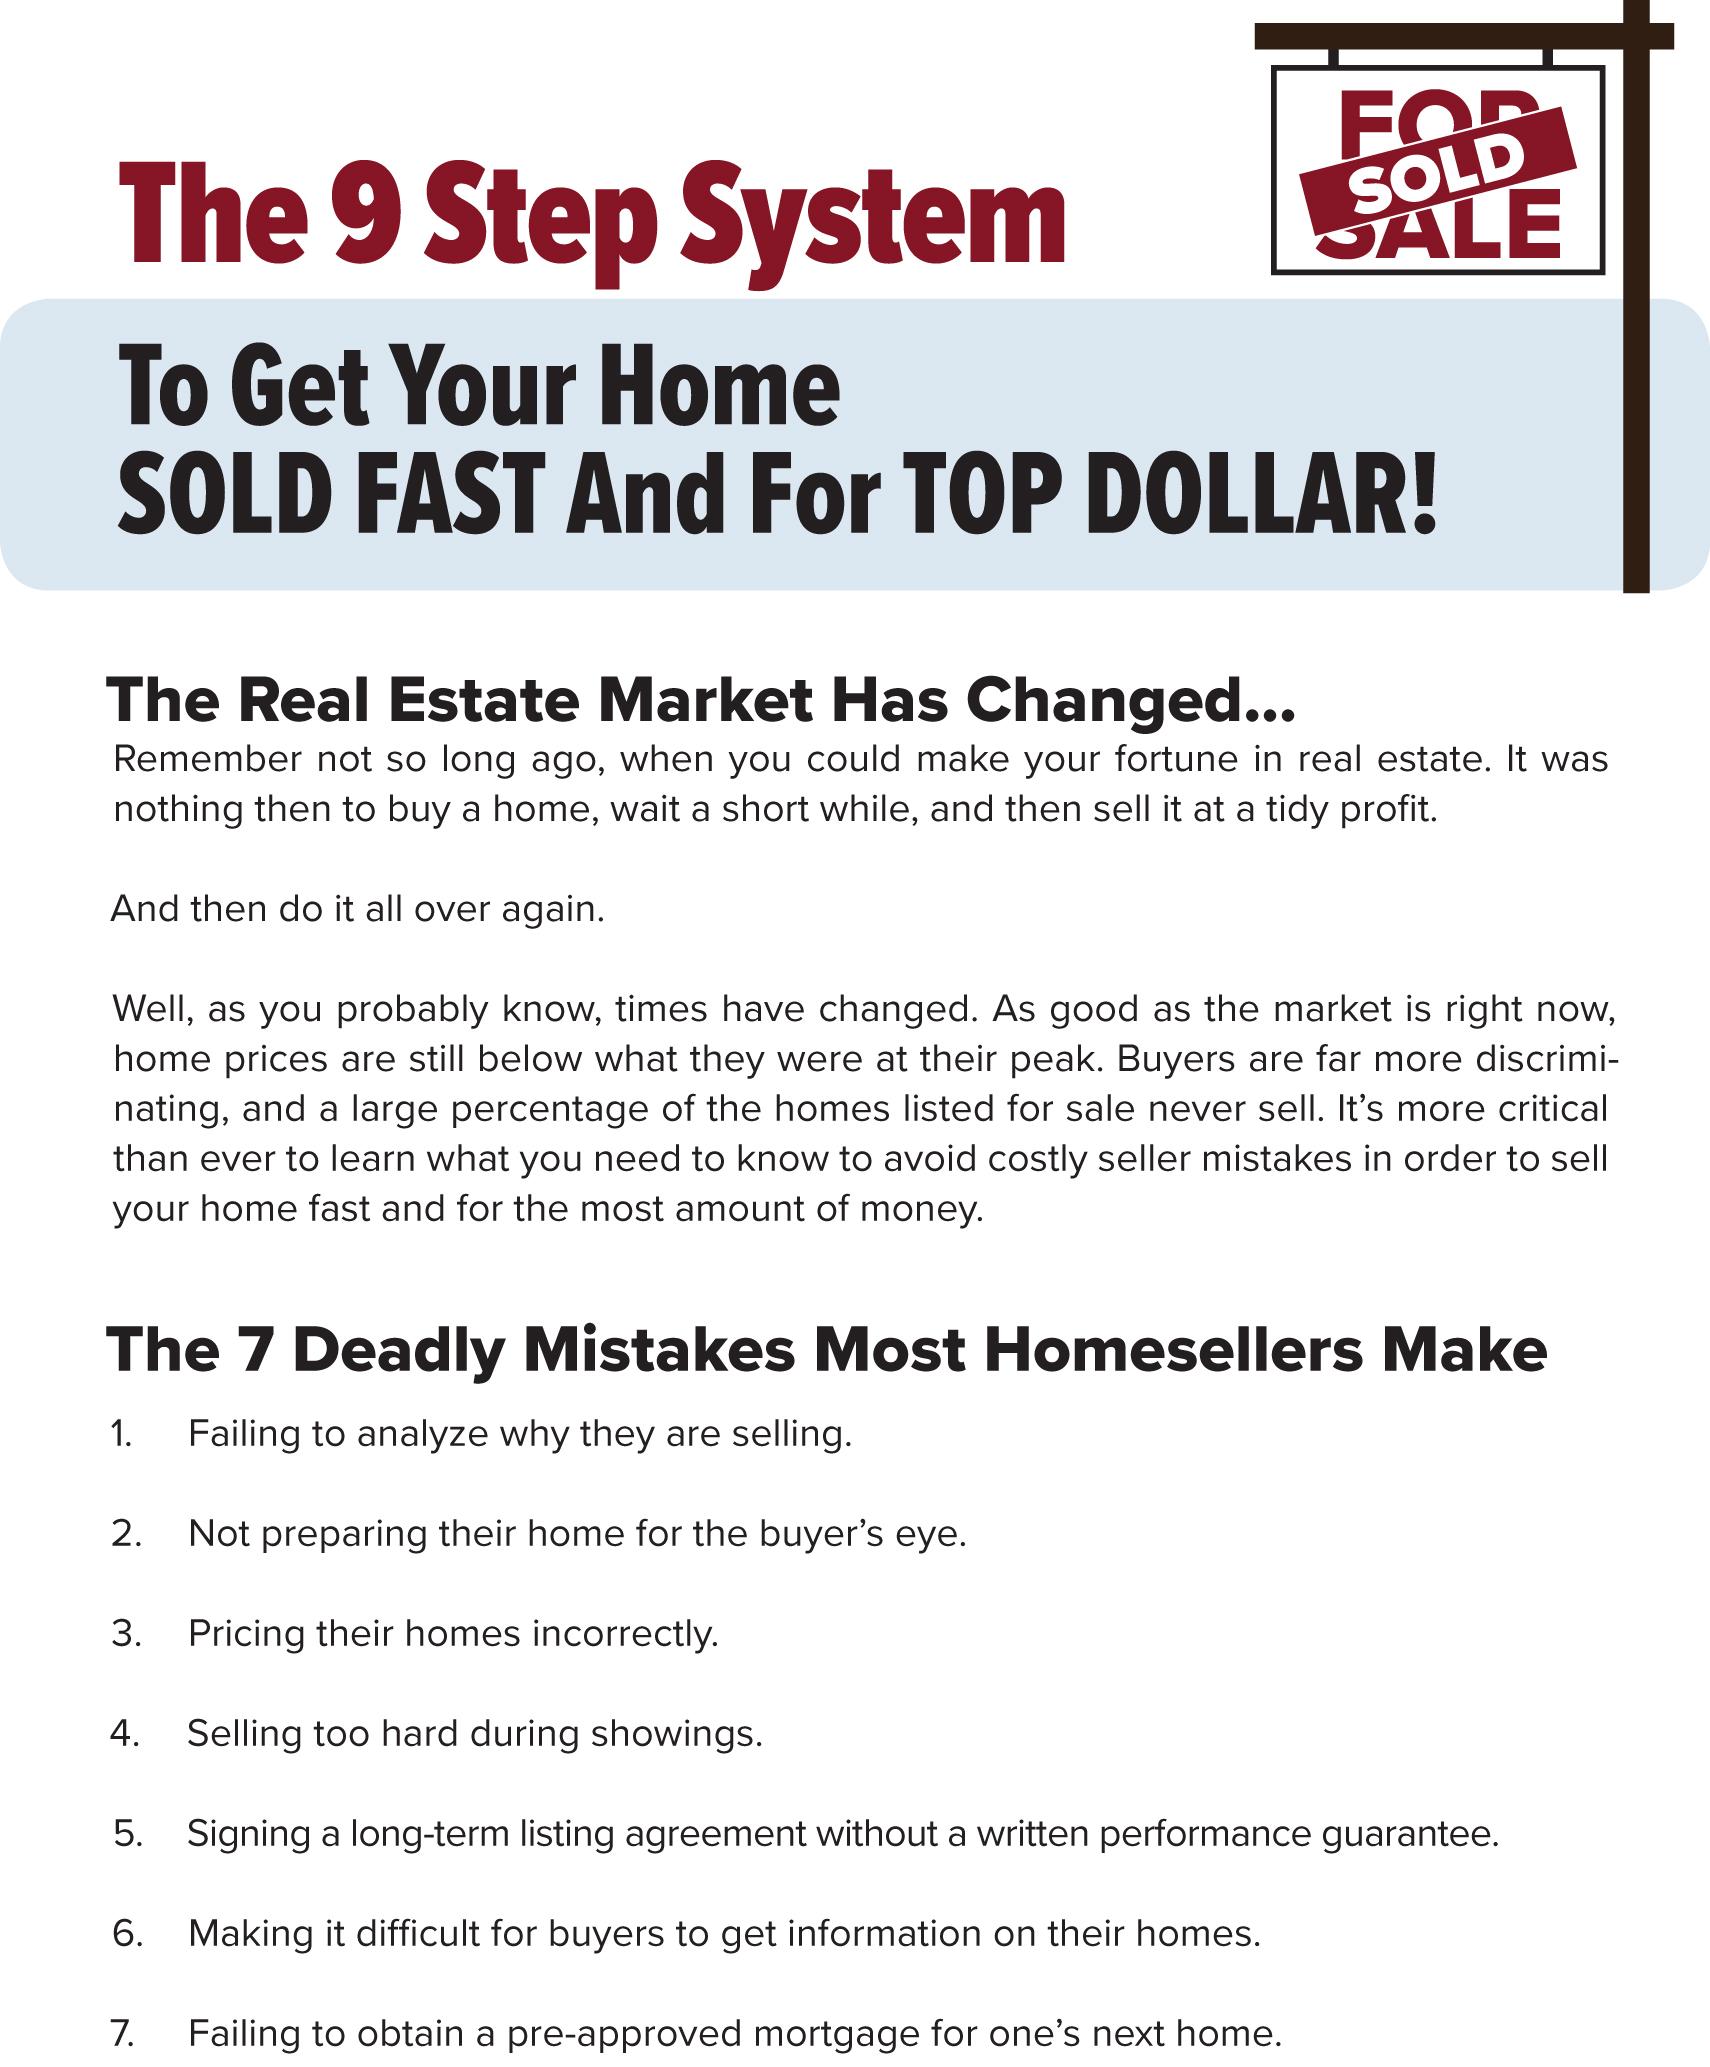 9 step system-1.jpg